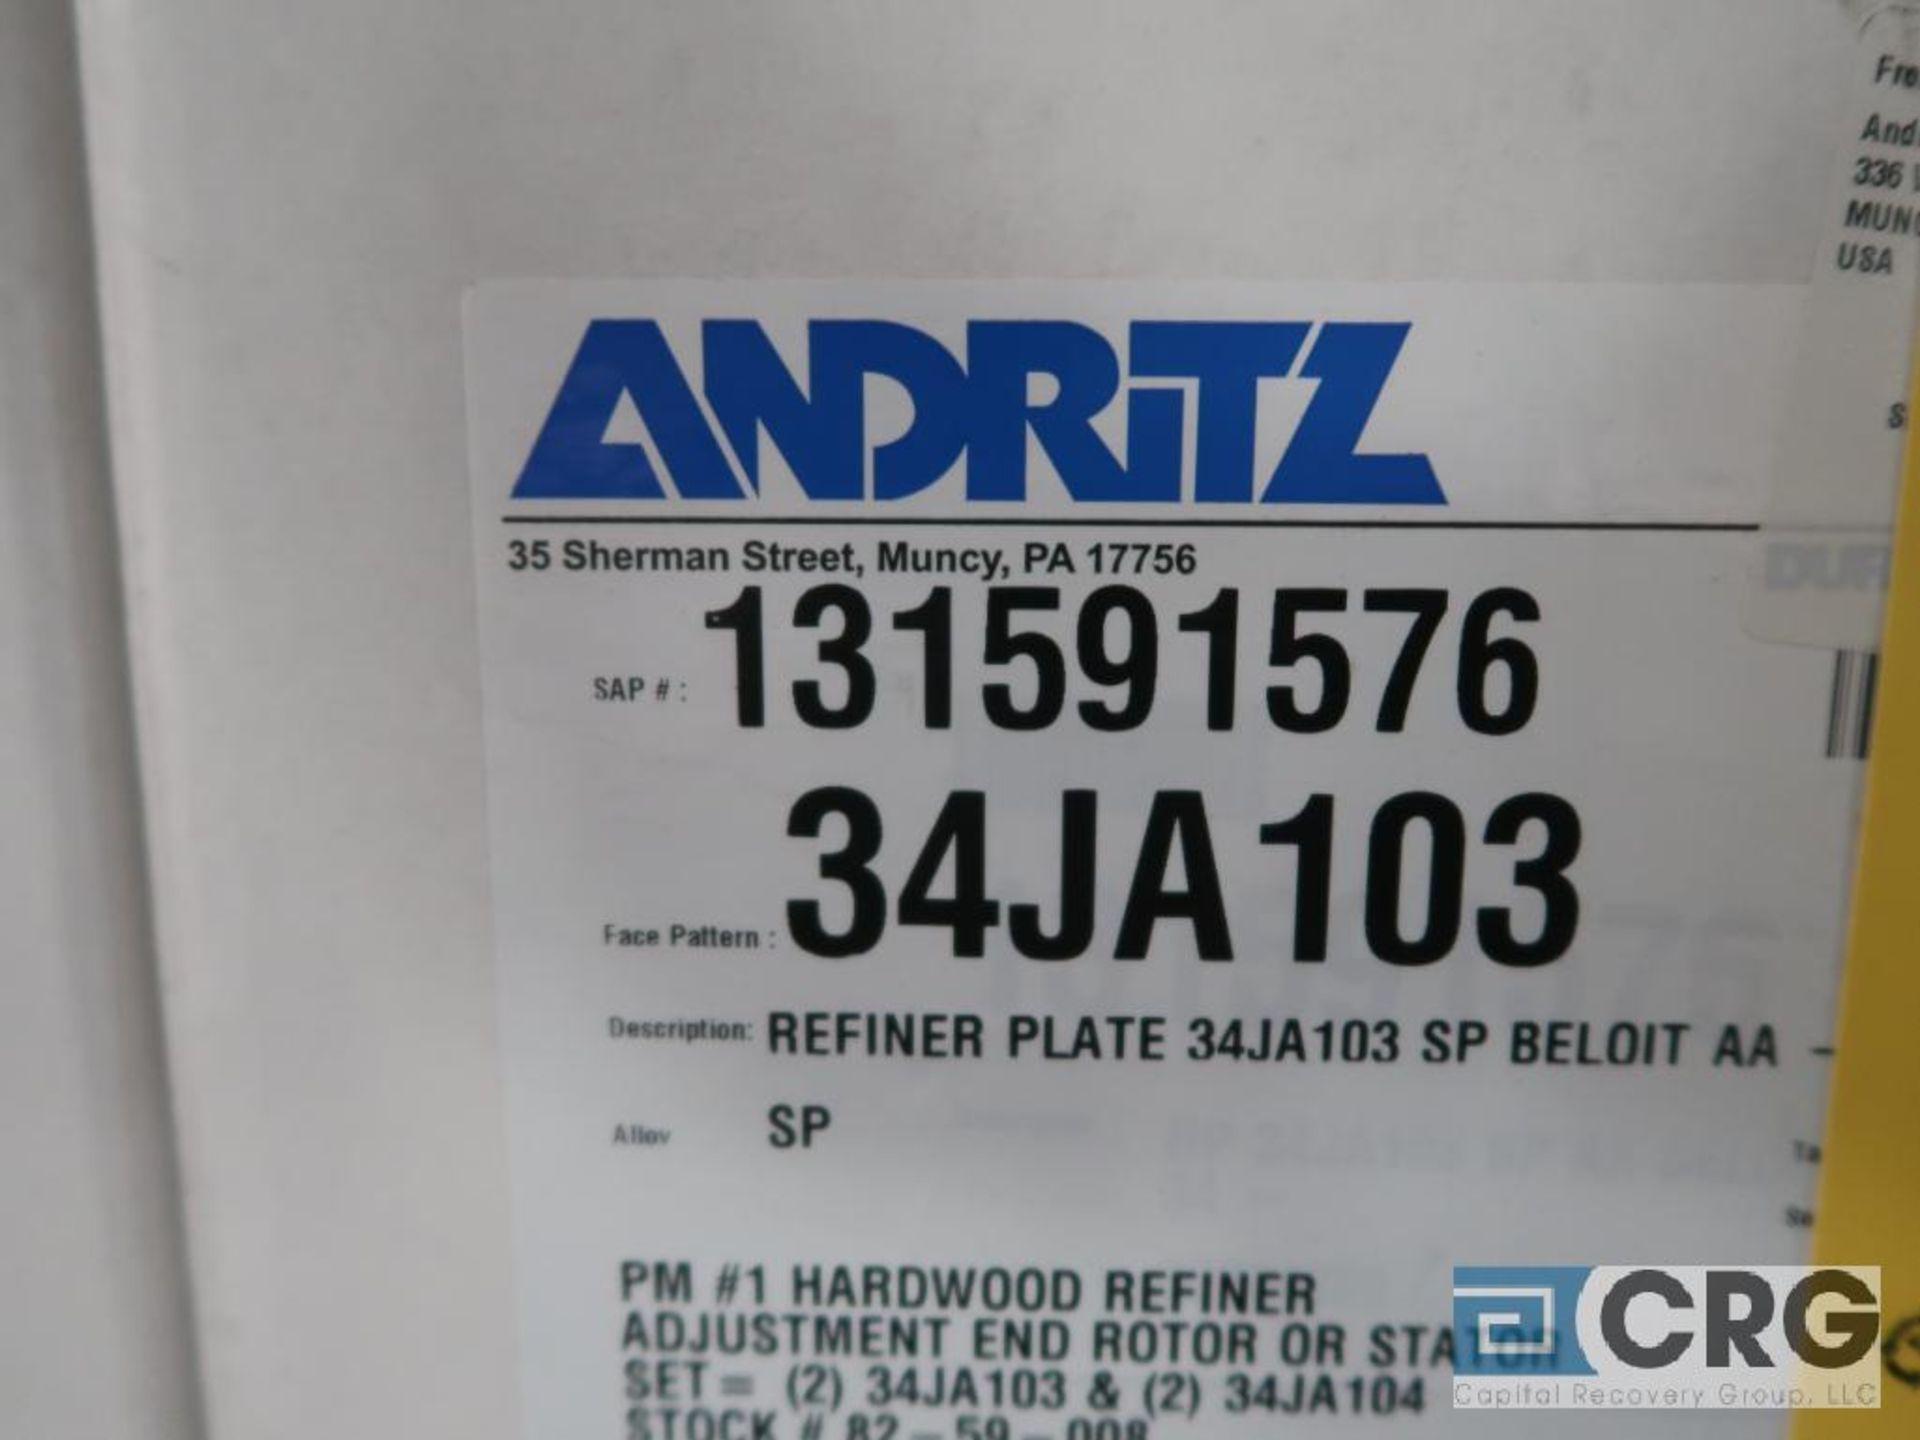 Lot of (4) Andritz 34JA103 refiner plates (Finish Building) - Image 2 of 2